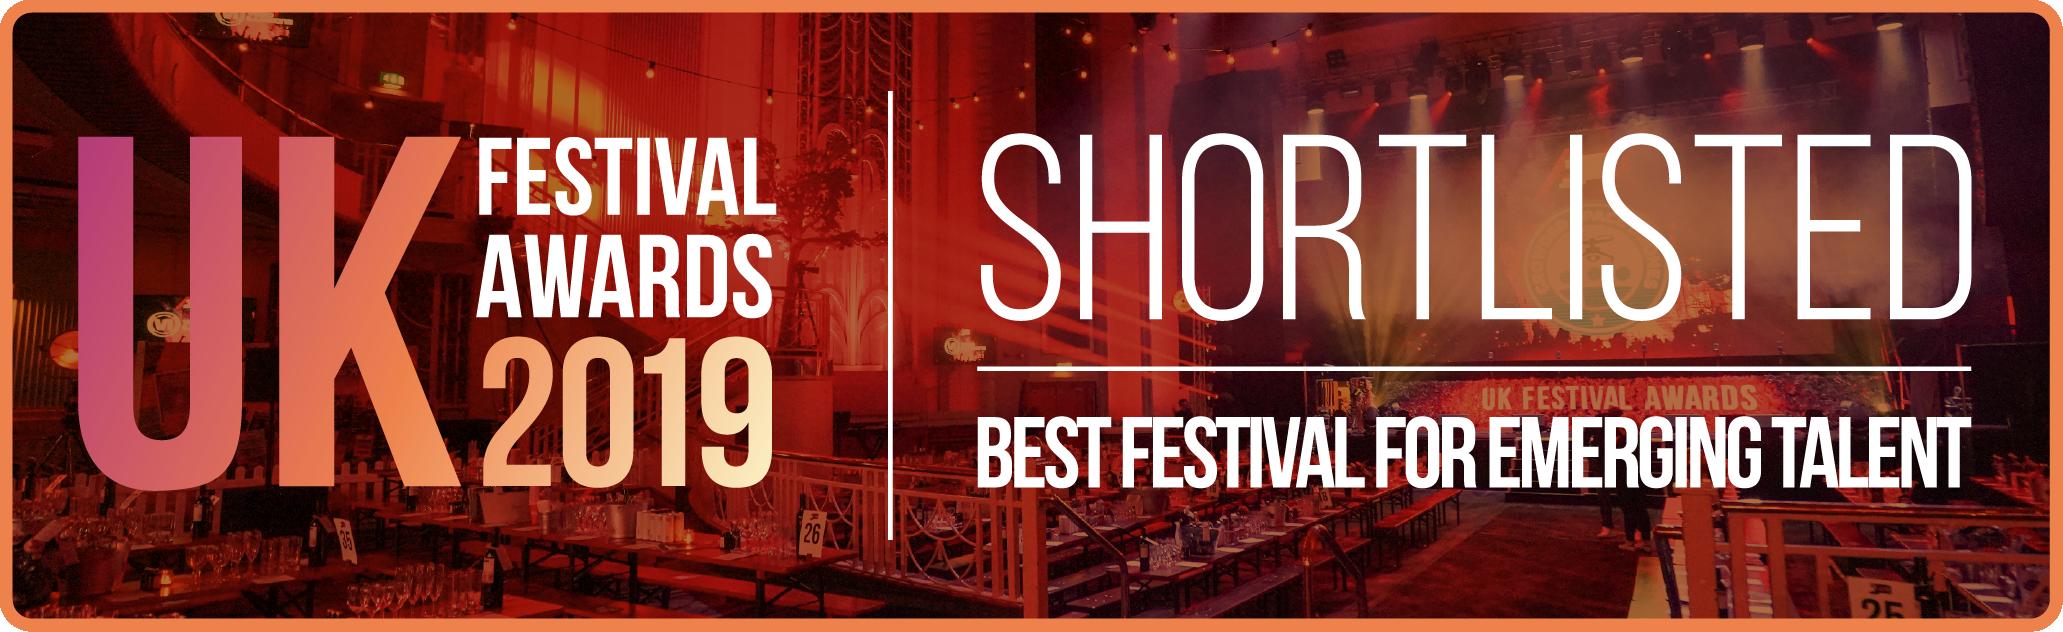 best festival for emerging talent